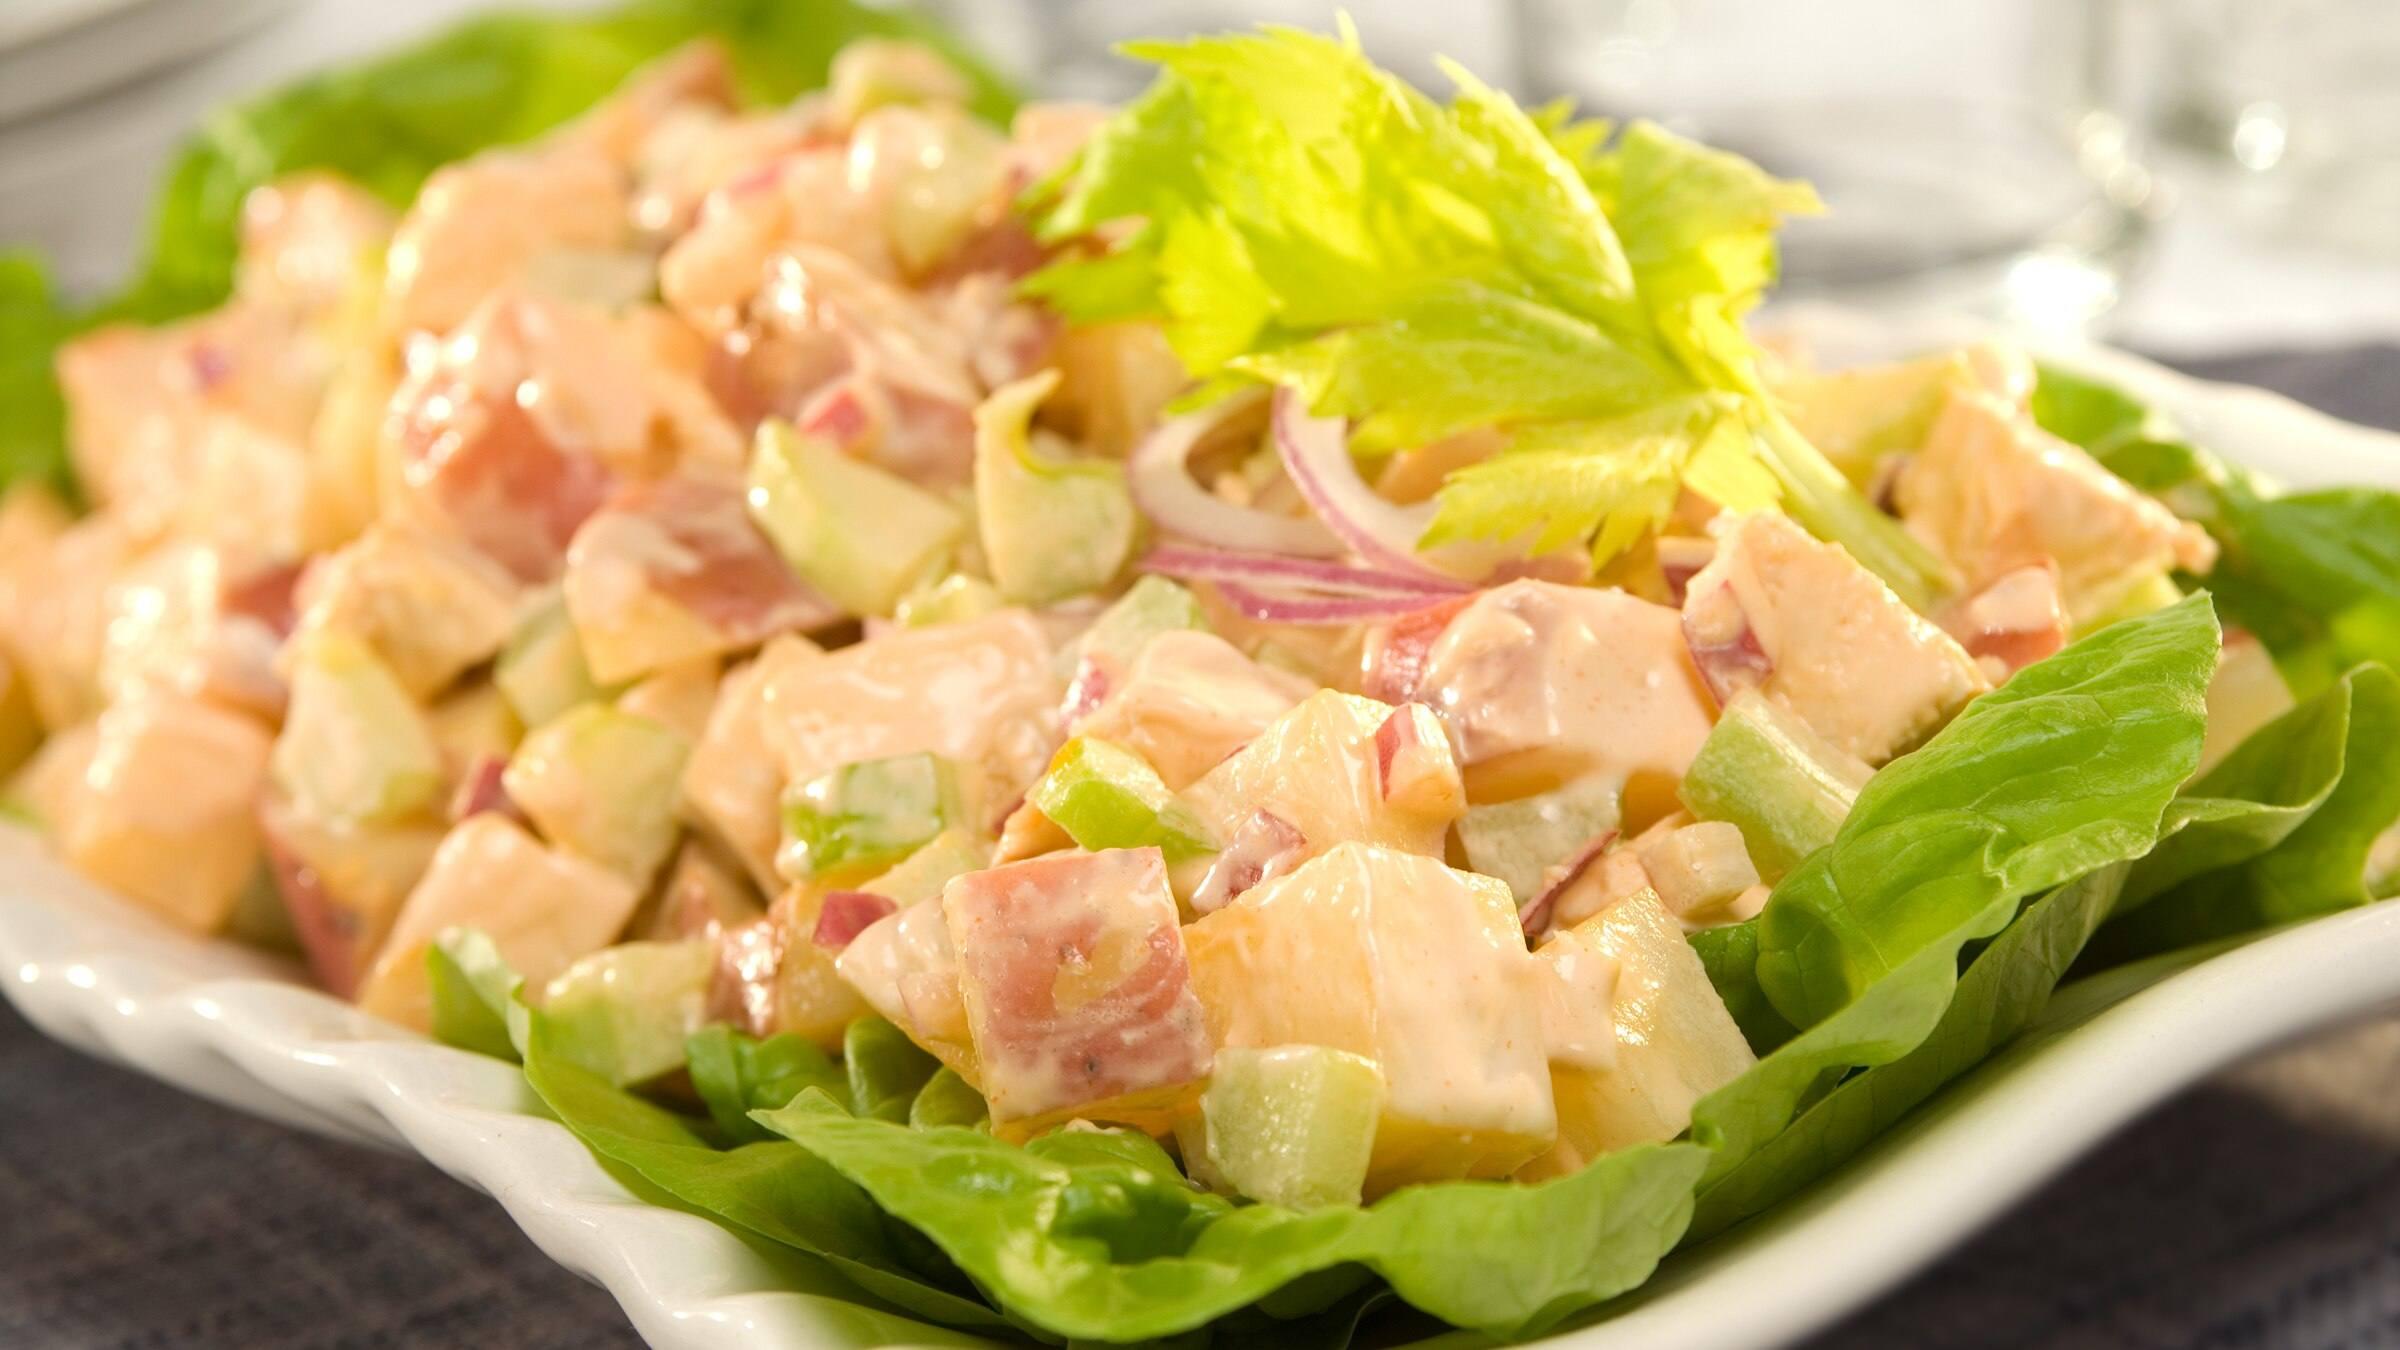 Buffalo Chicken & Potato Salad Recipe